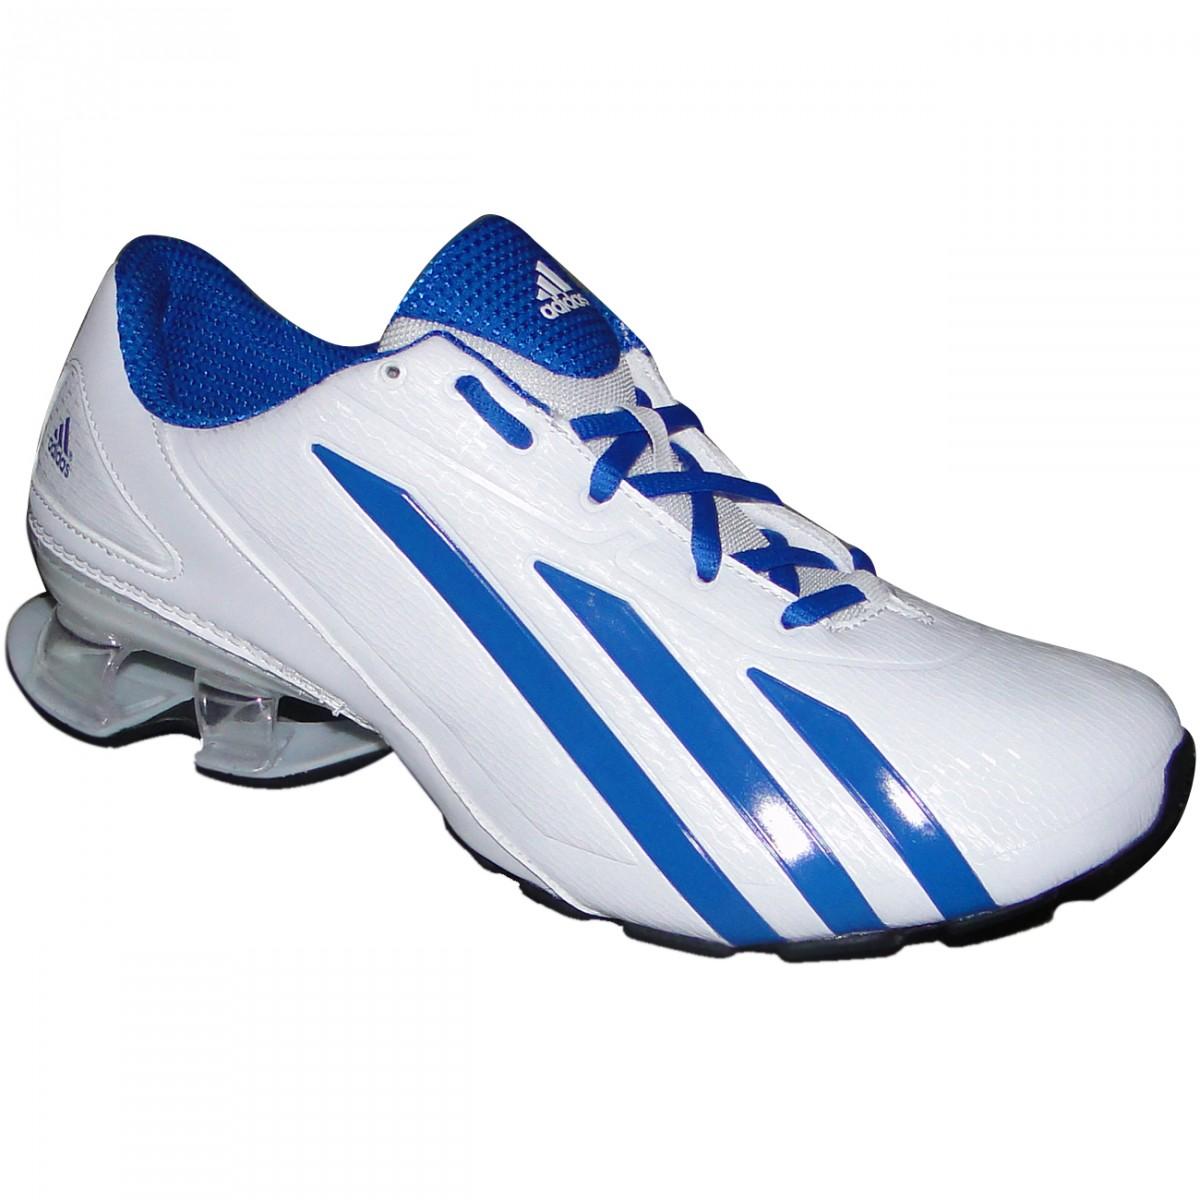 Tenis Adidas Meteor M Q23709 - Branco Azul - Chuteira Nike 9cbda62cc6975